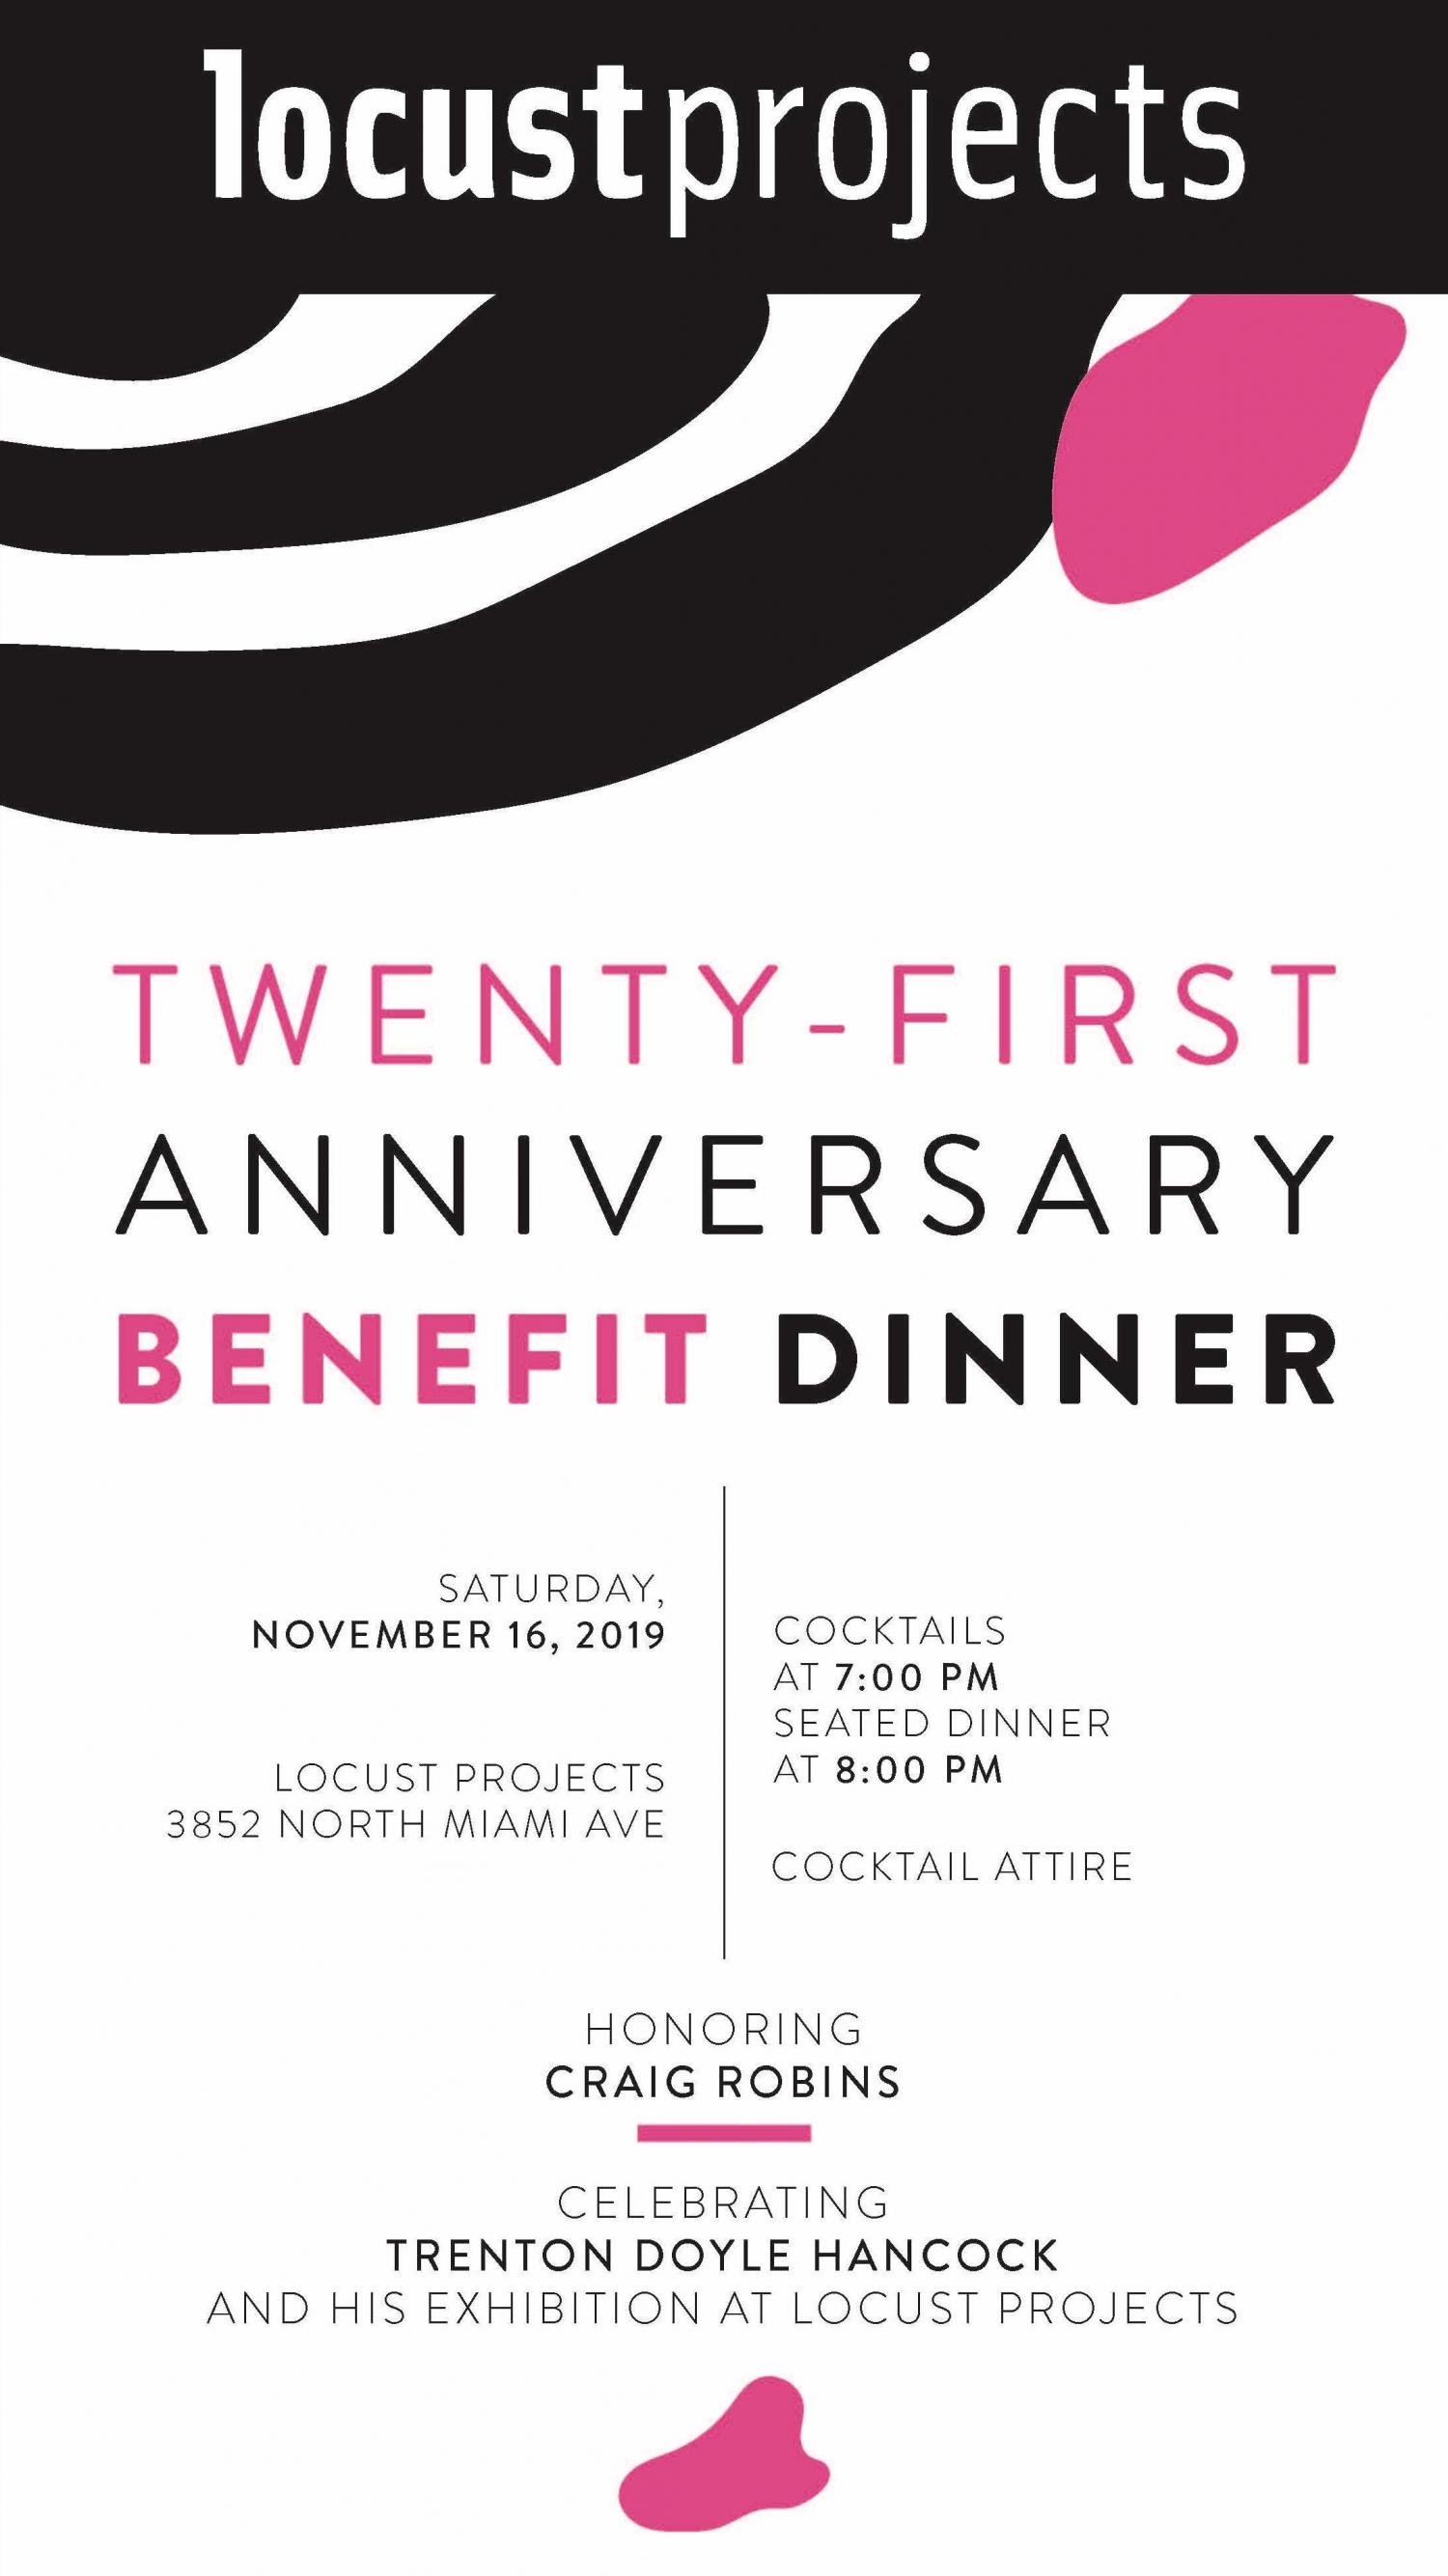 21st Anniversary Benefit Dinner